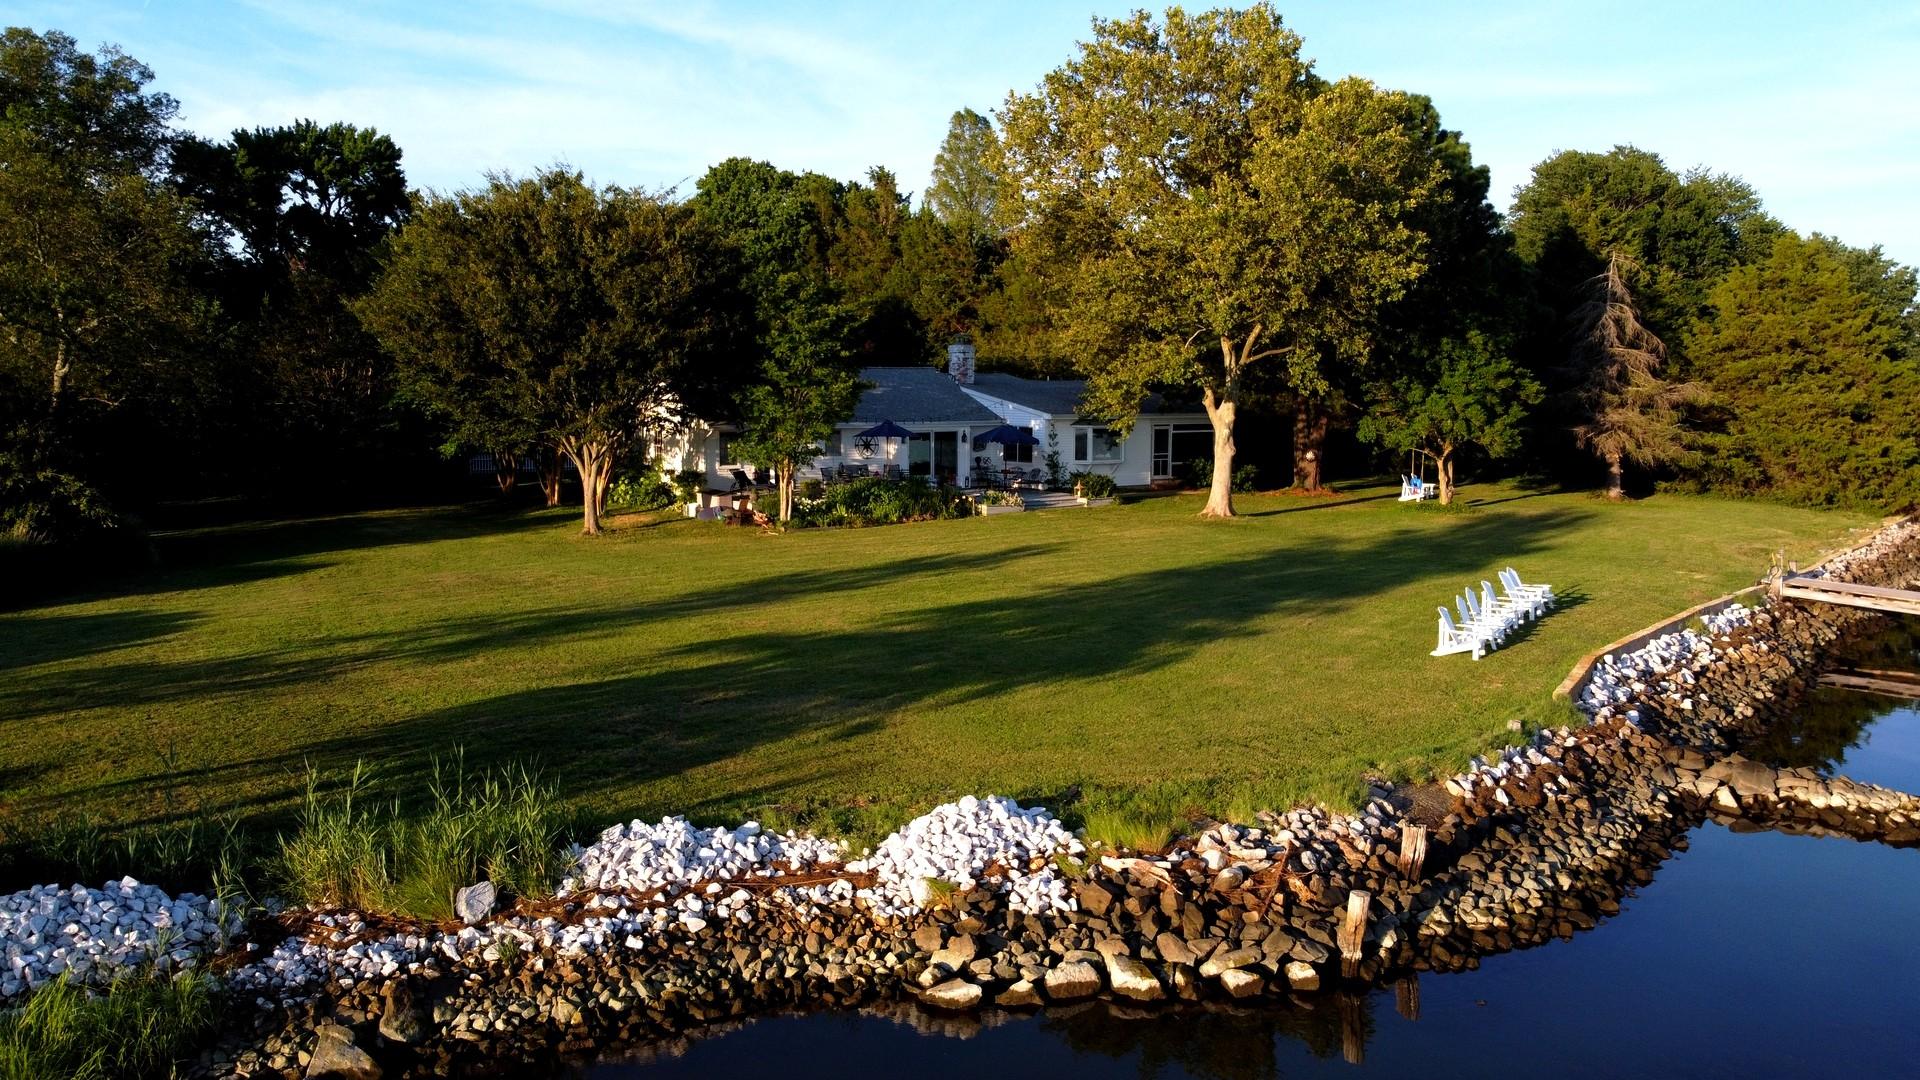 Chesapeake bay drone services